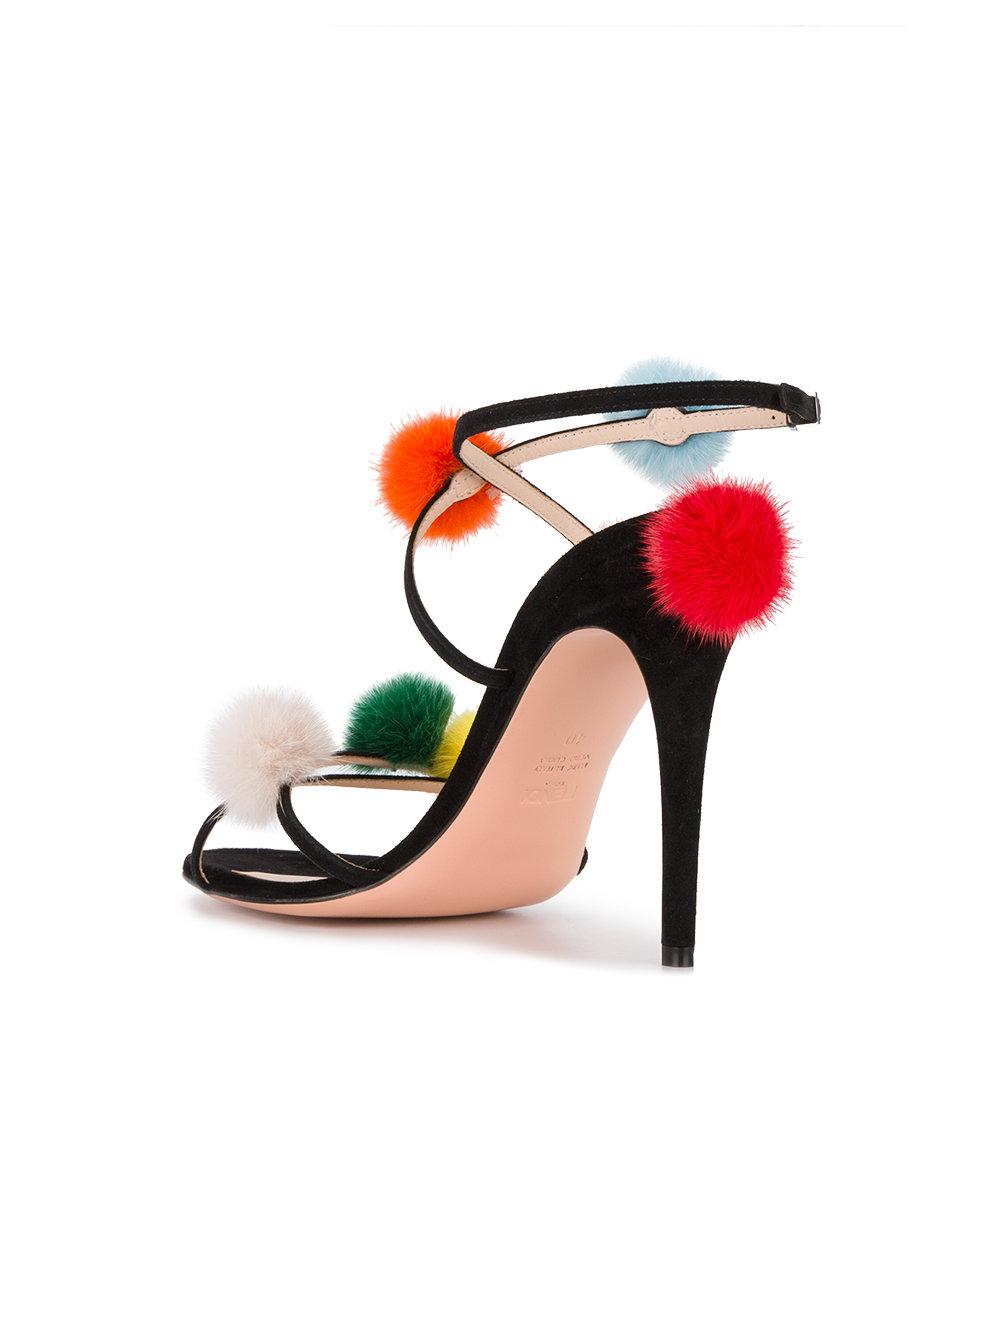 FENDI sandals - $1,000